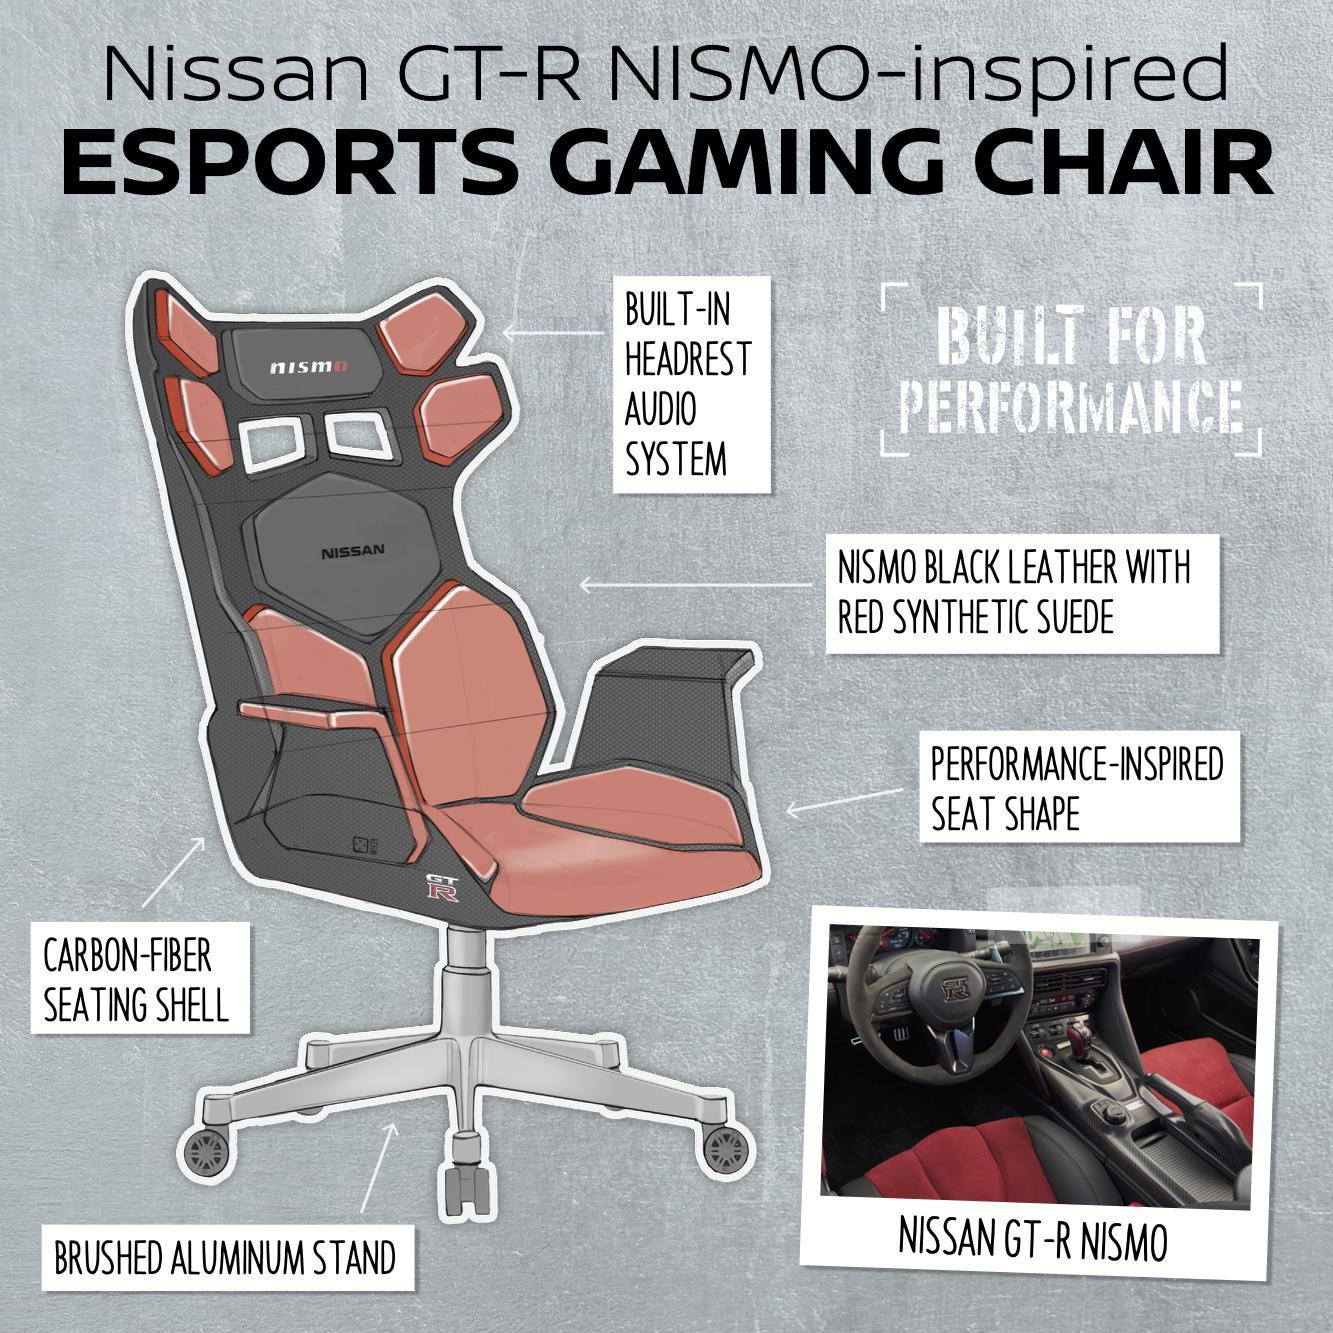 Nissan eSport chair